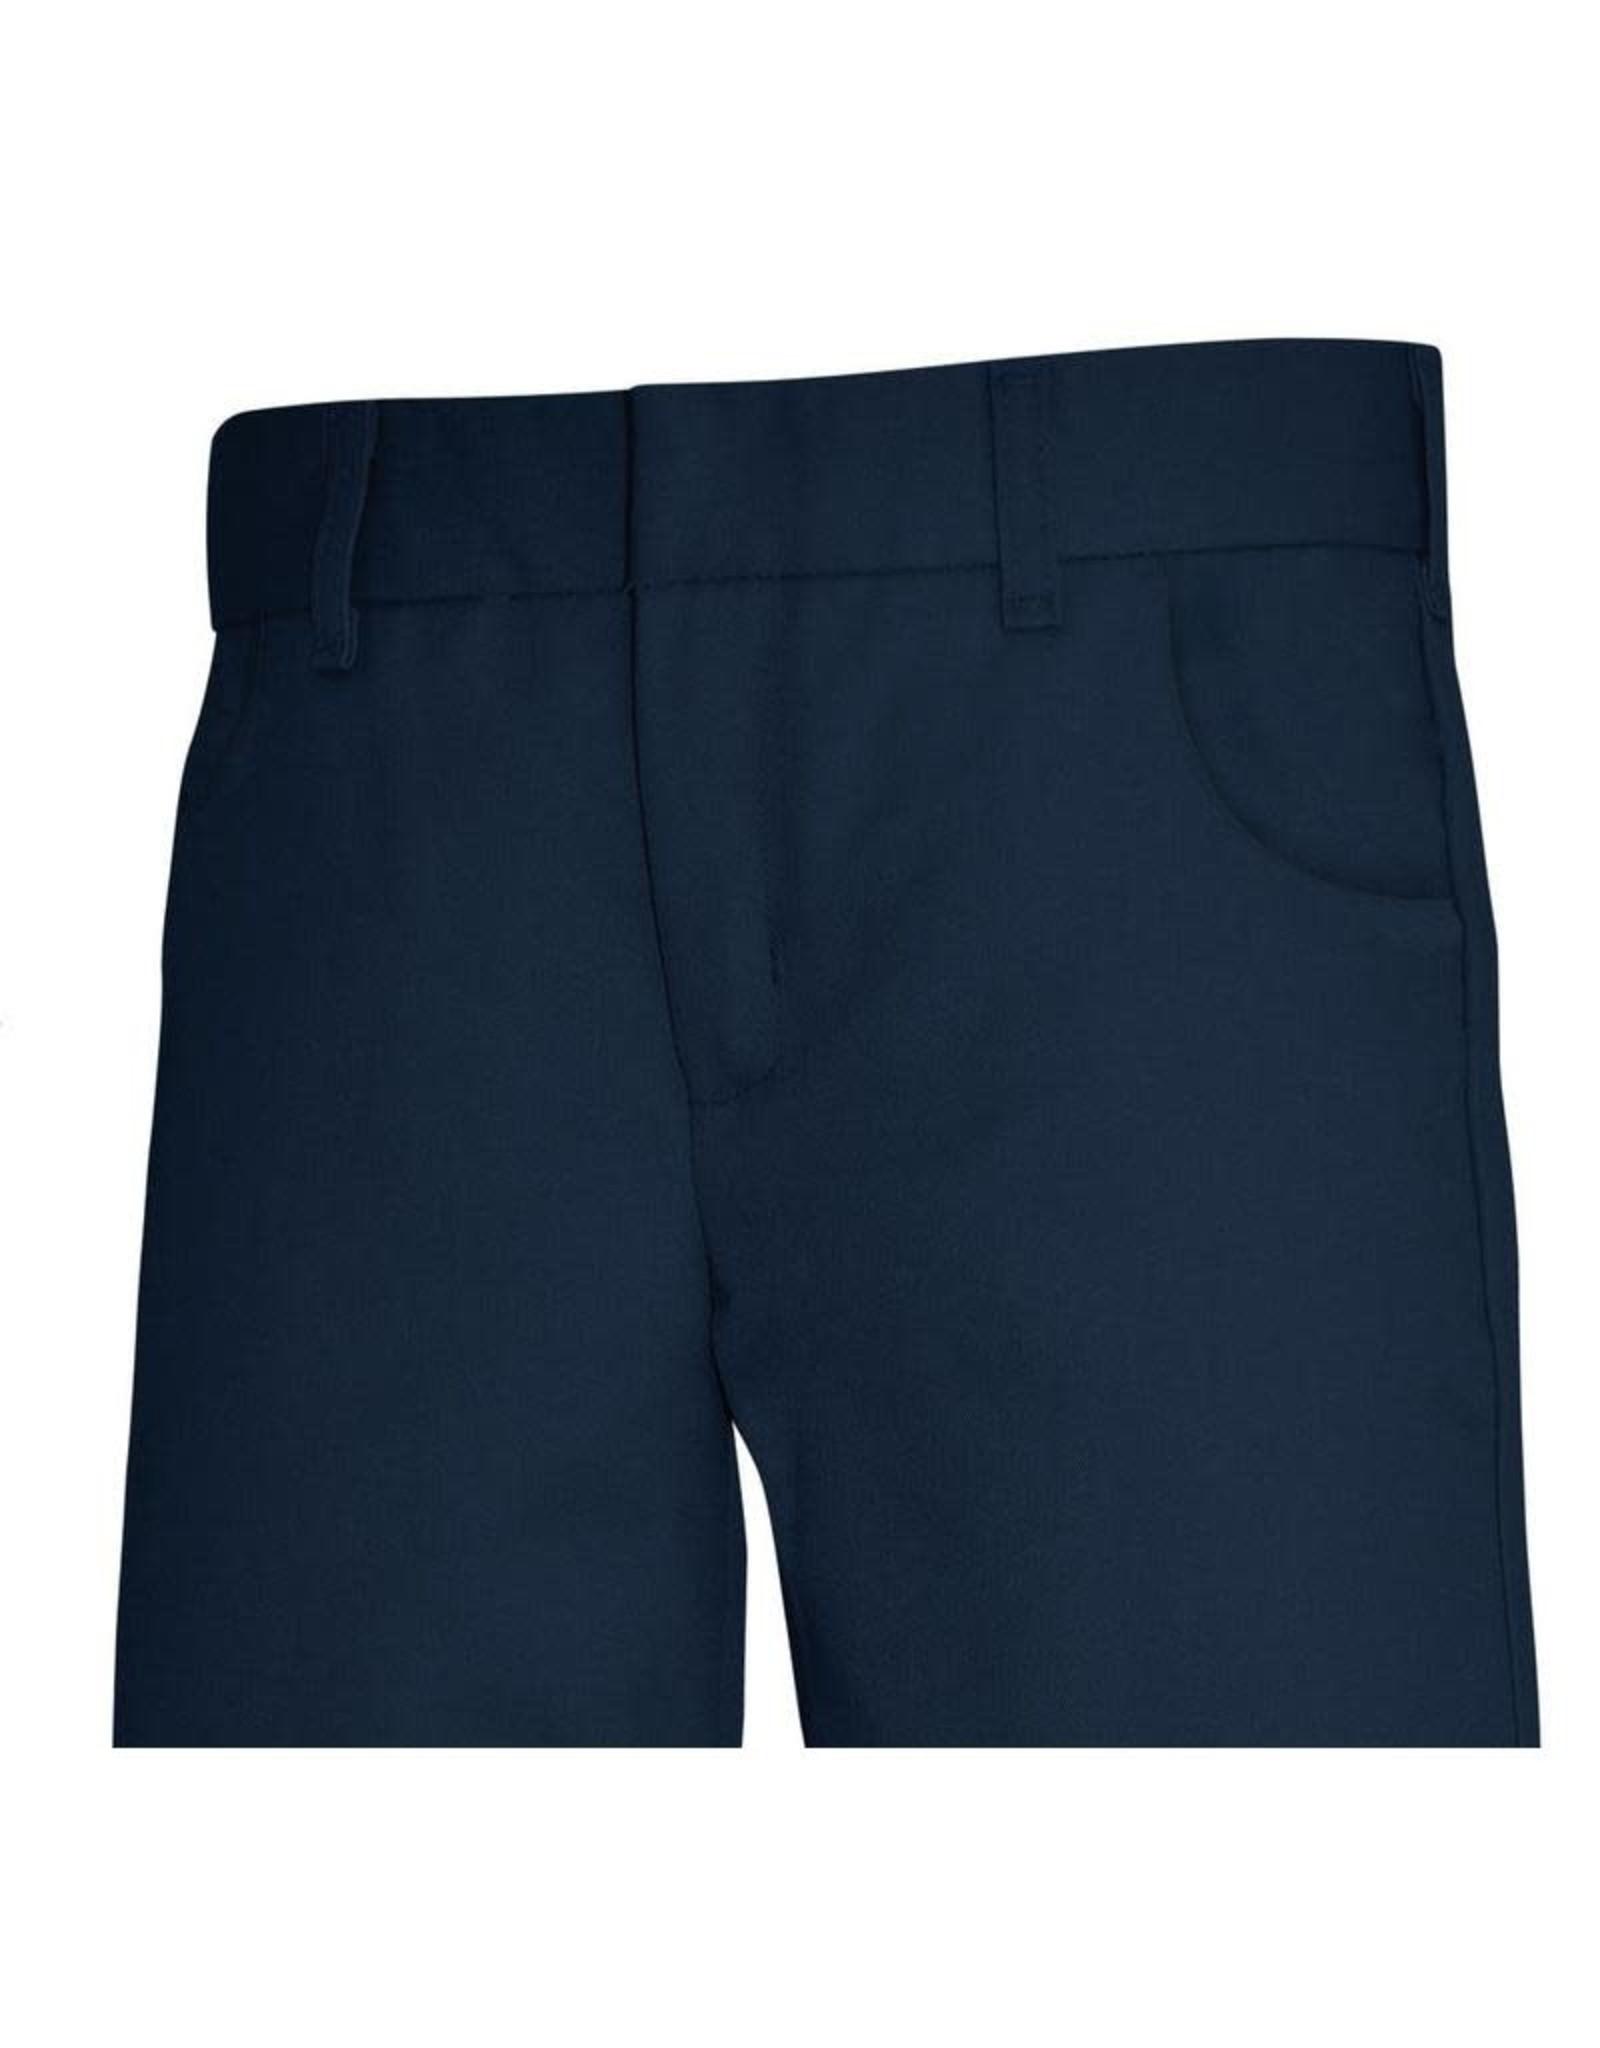 UNIFORM Sale-Girls Navy Shorts-OLD STYLE-Final Sale